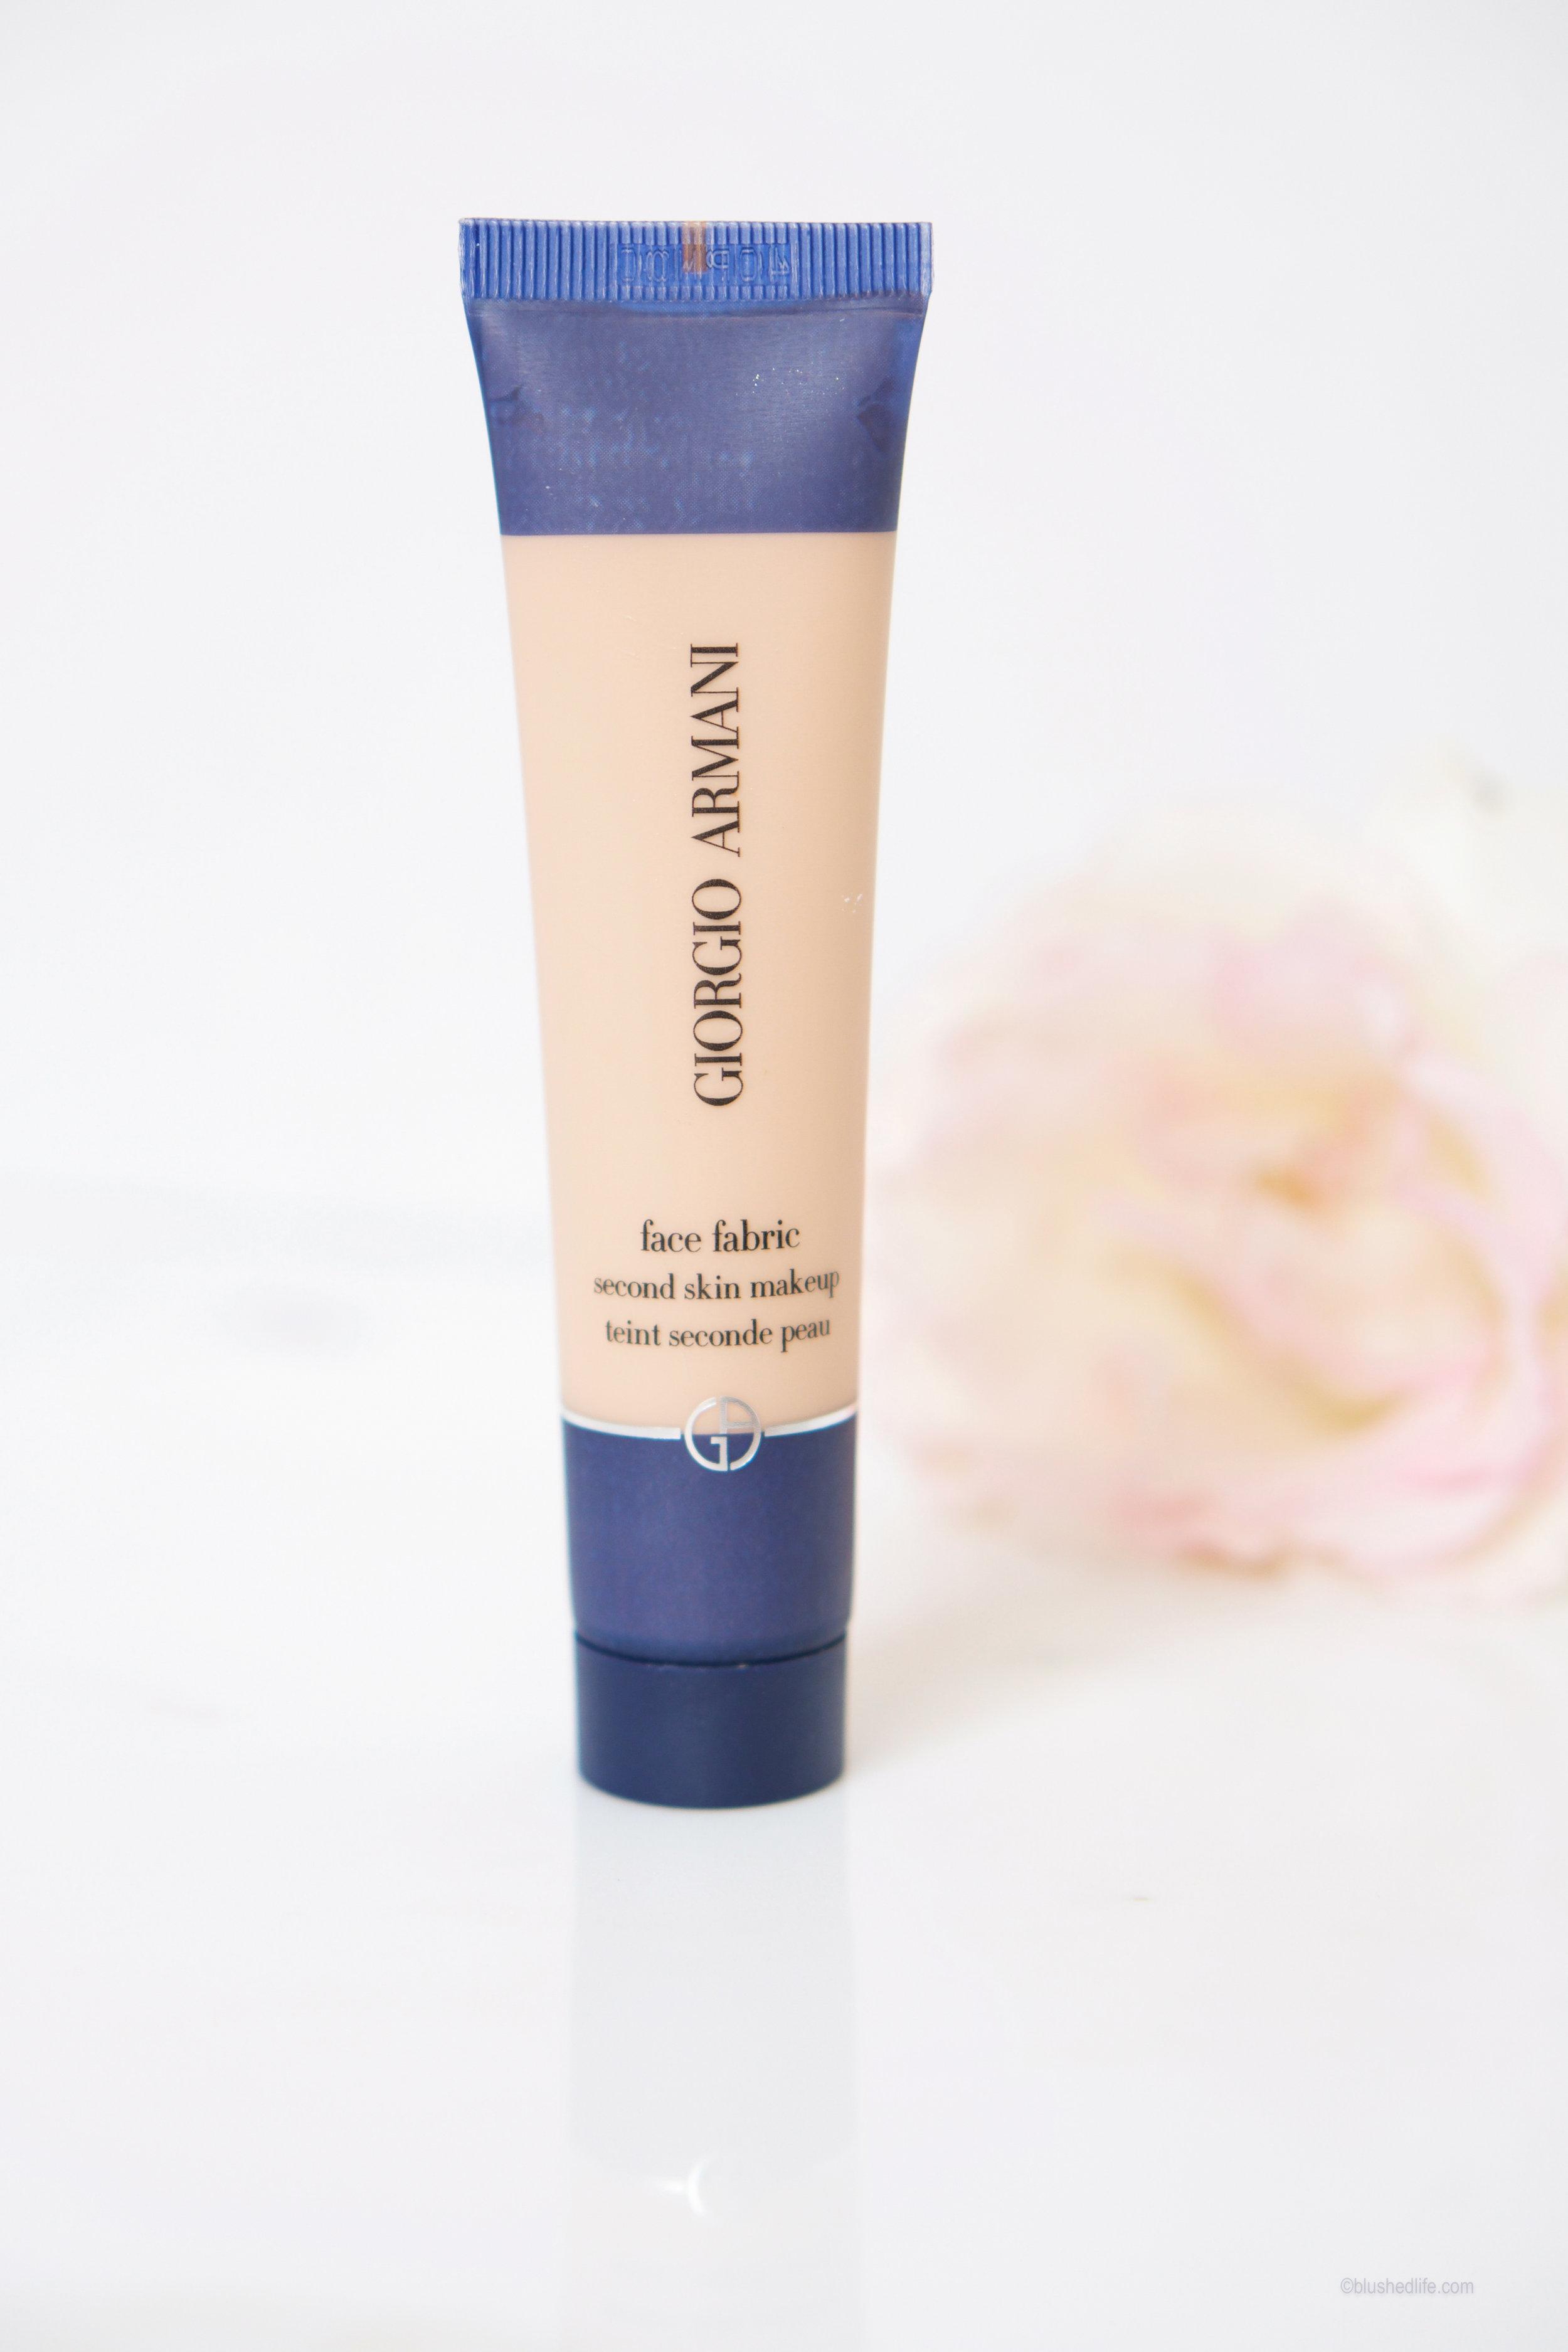 Giorgio Armani Face Fabric Second Skin Makeup in #1 -